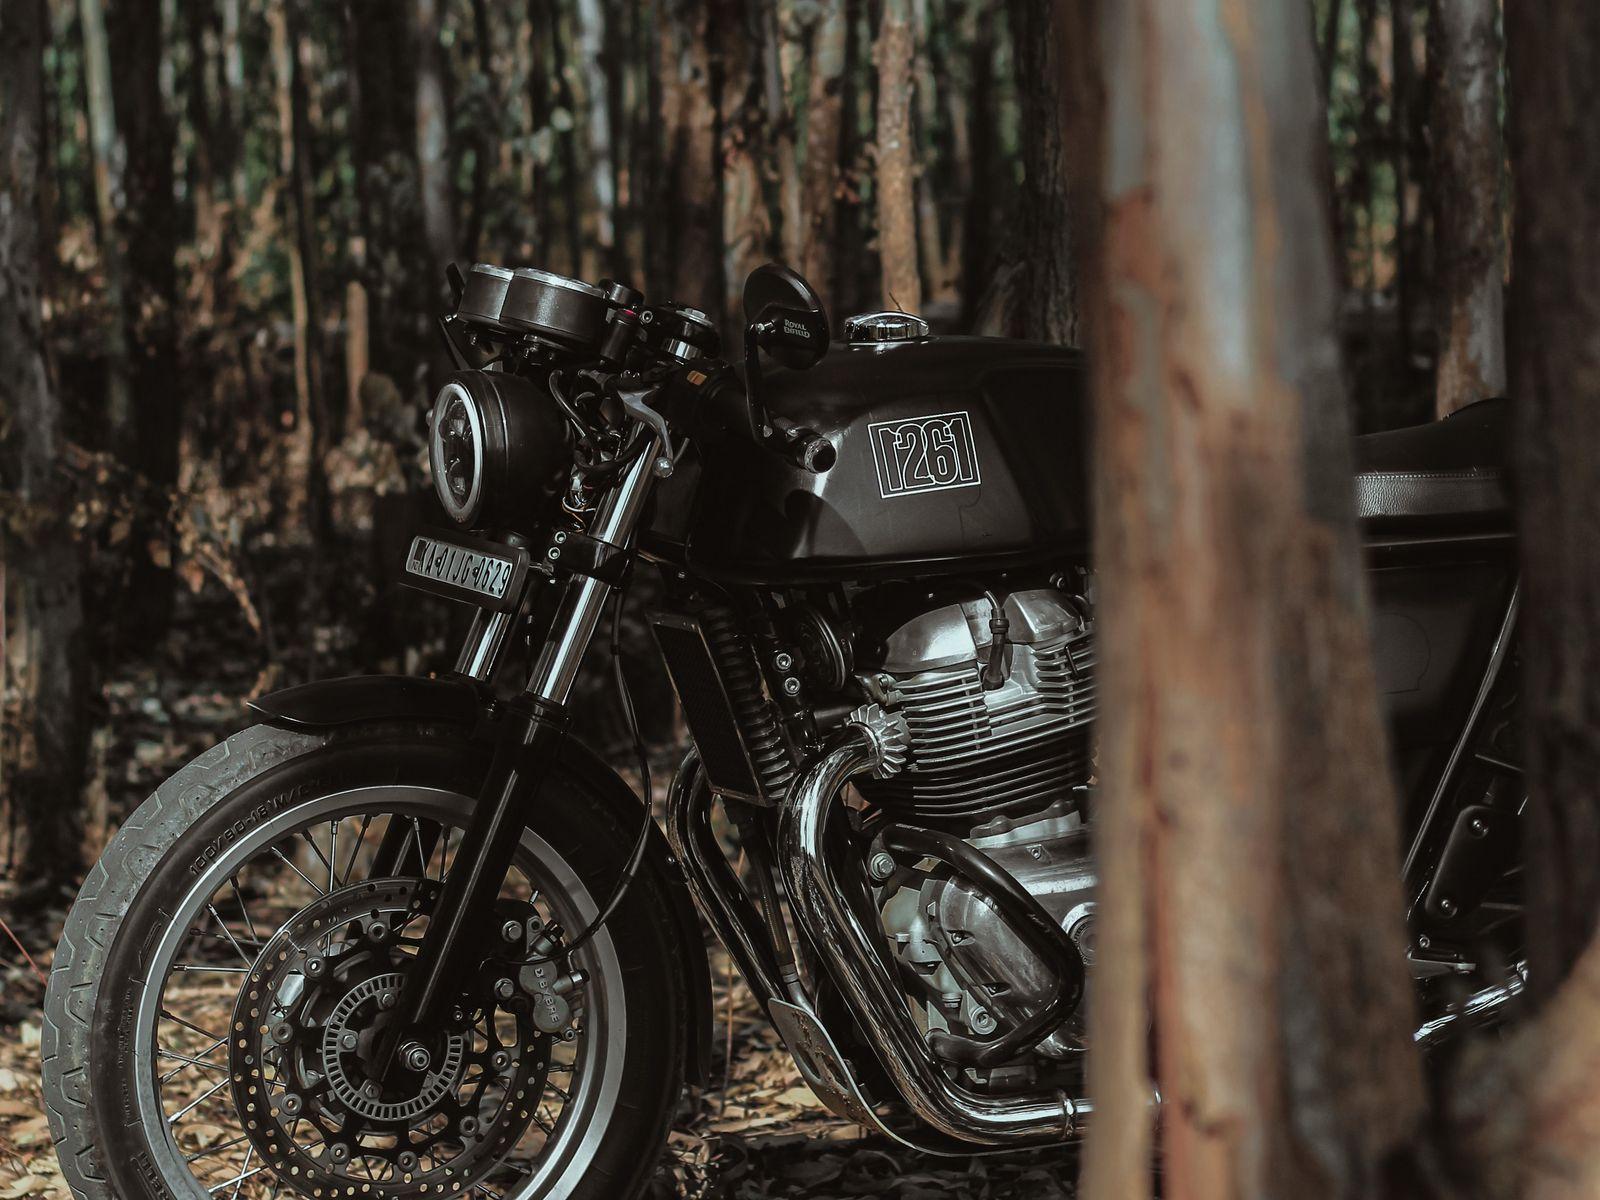 1600x1200 Wallpaper royal enfield, motorcycle, bike, black, forest